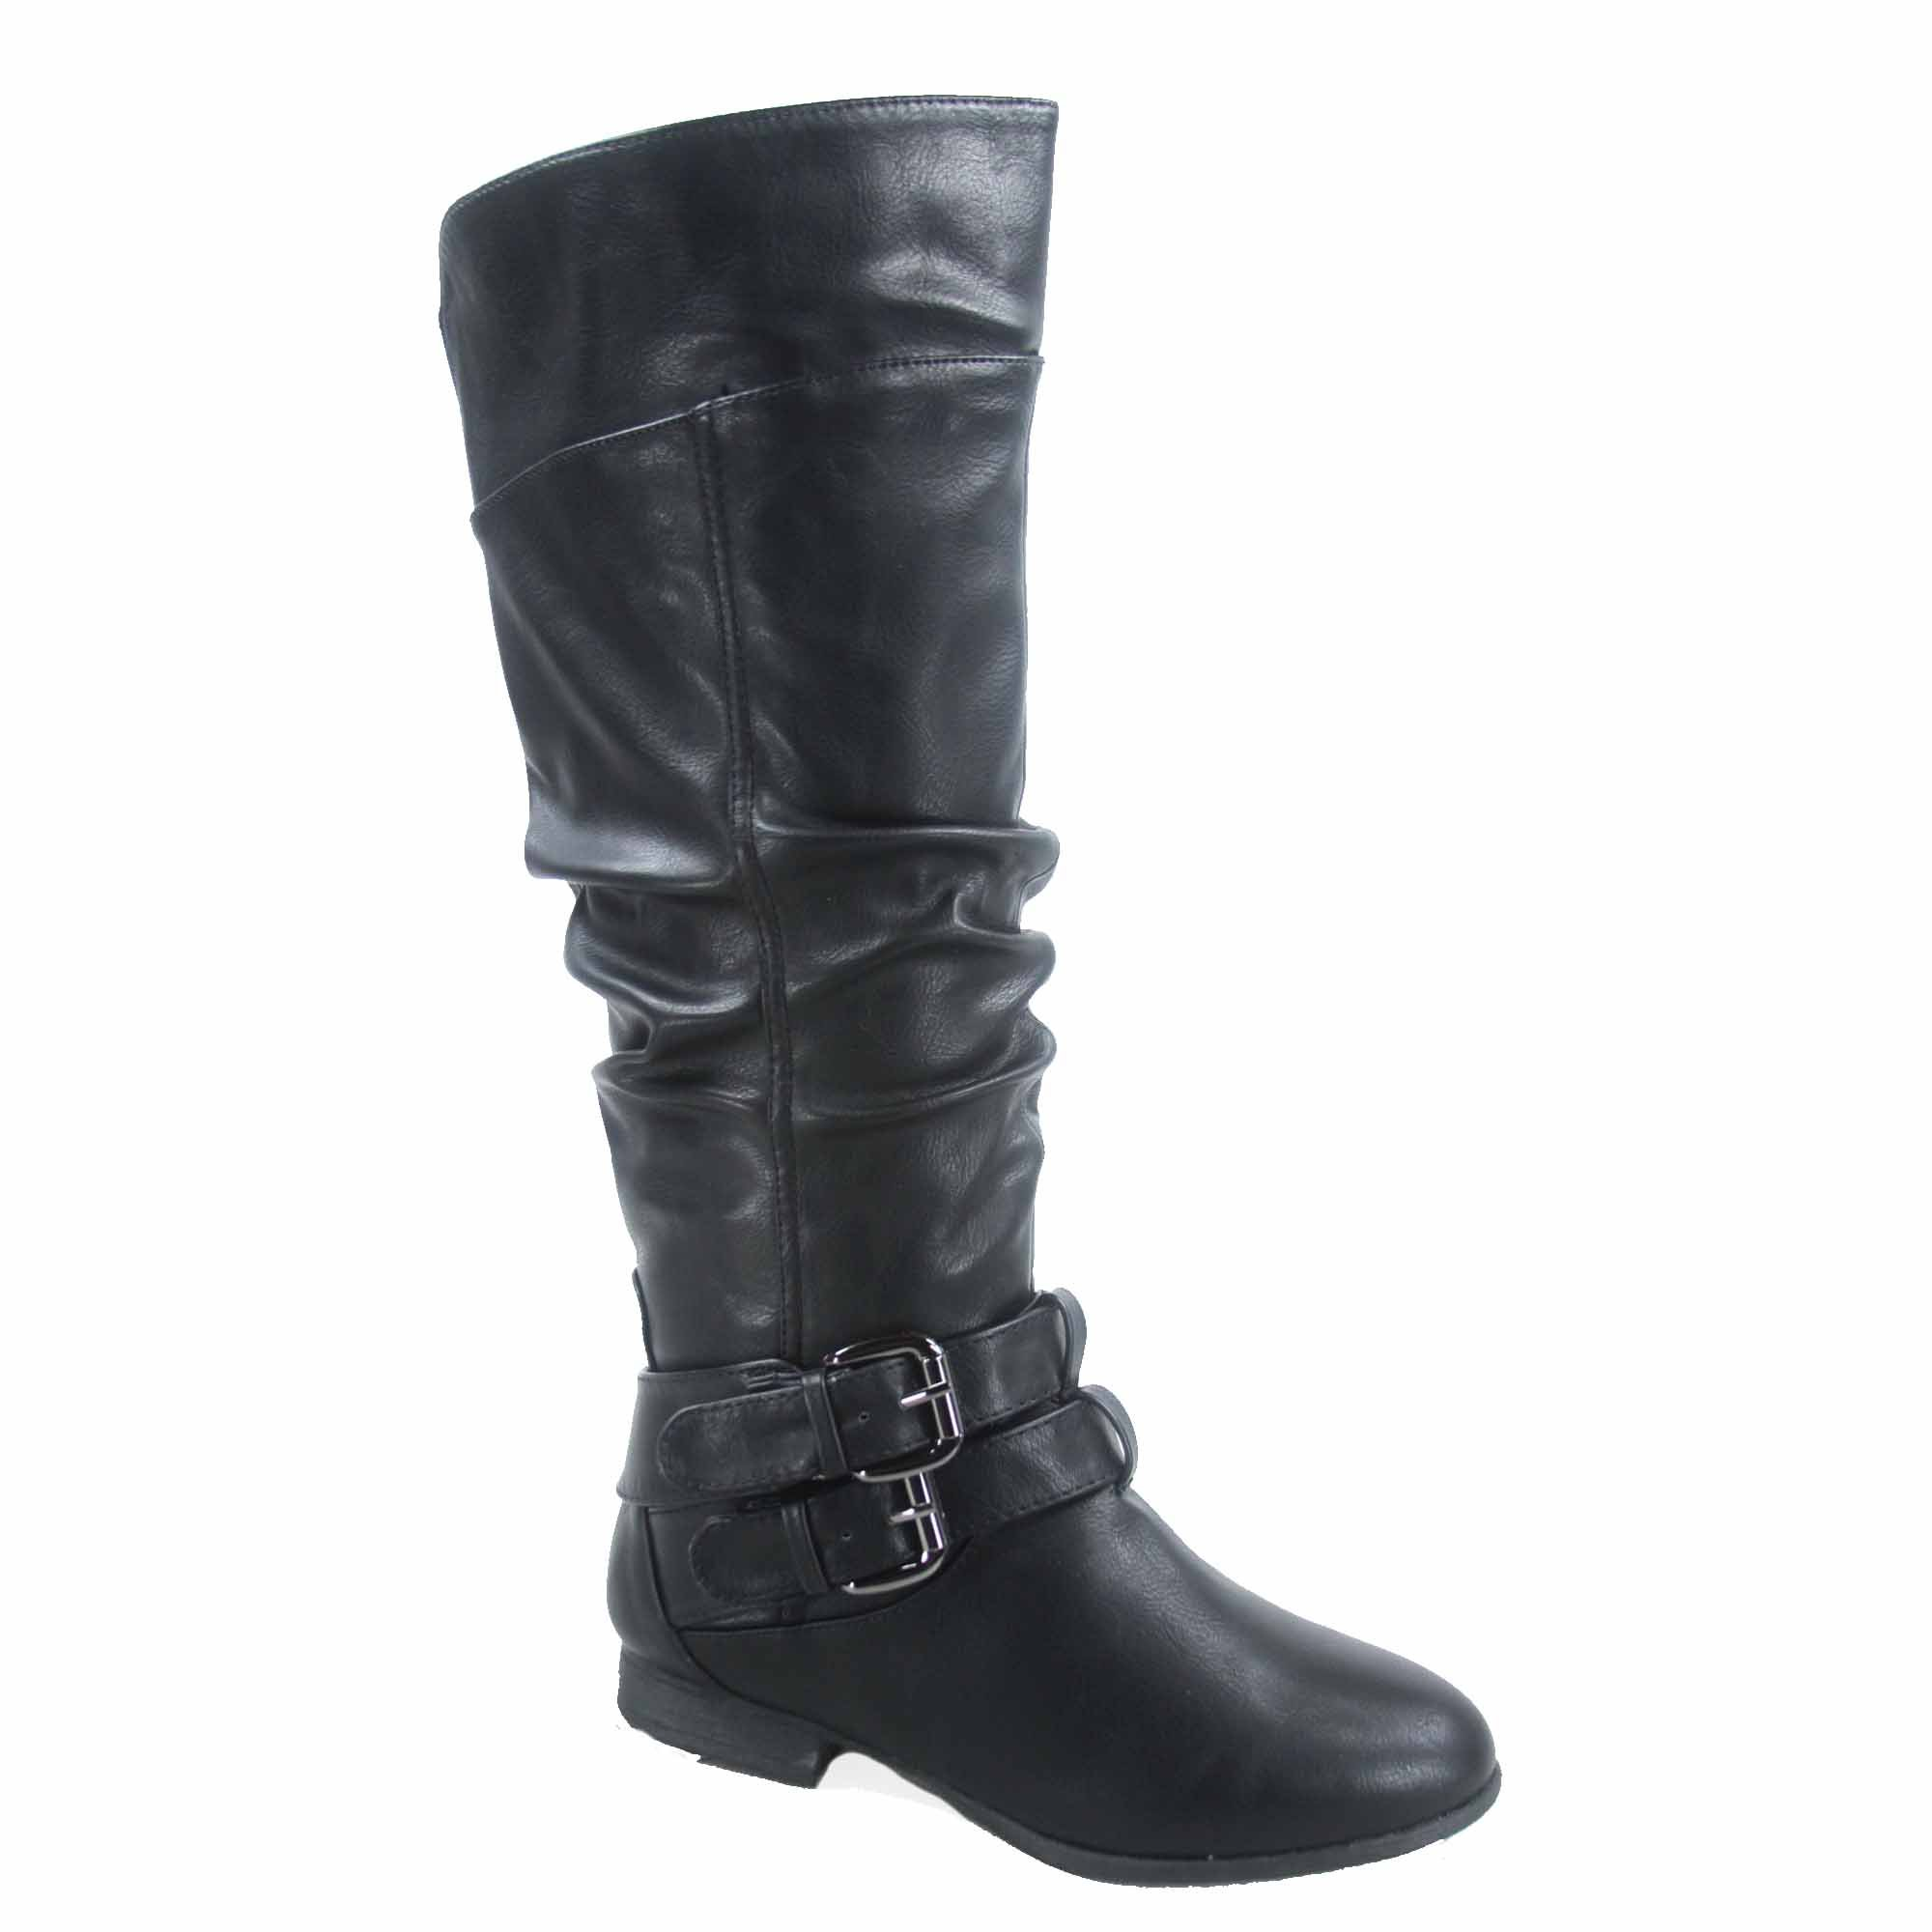 Top Moda Coco-20 Women's Fashion Round Toe Low Heel Knee High Zipper Riding Boot Shoes (6, Black)